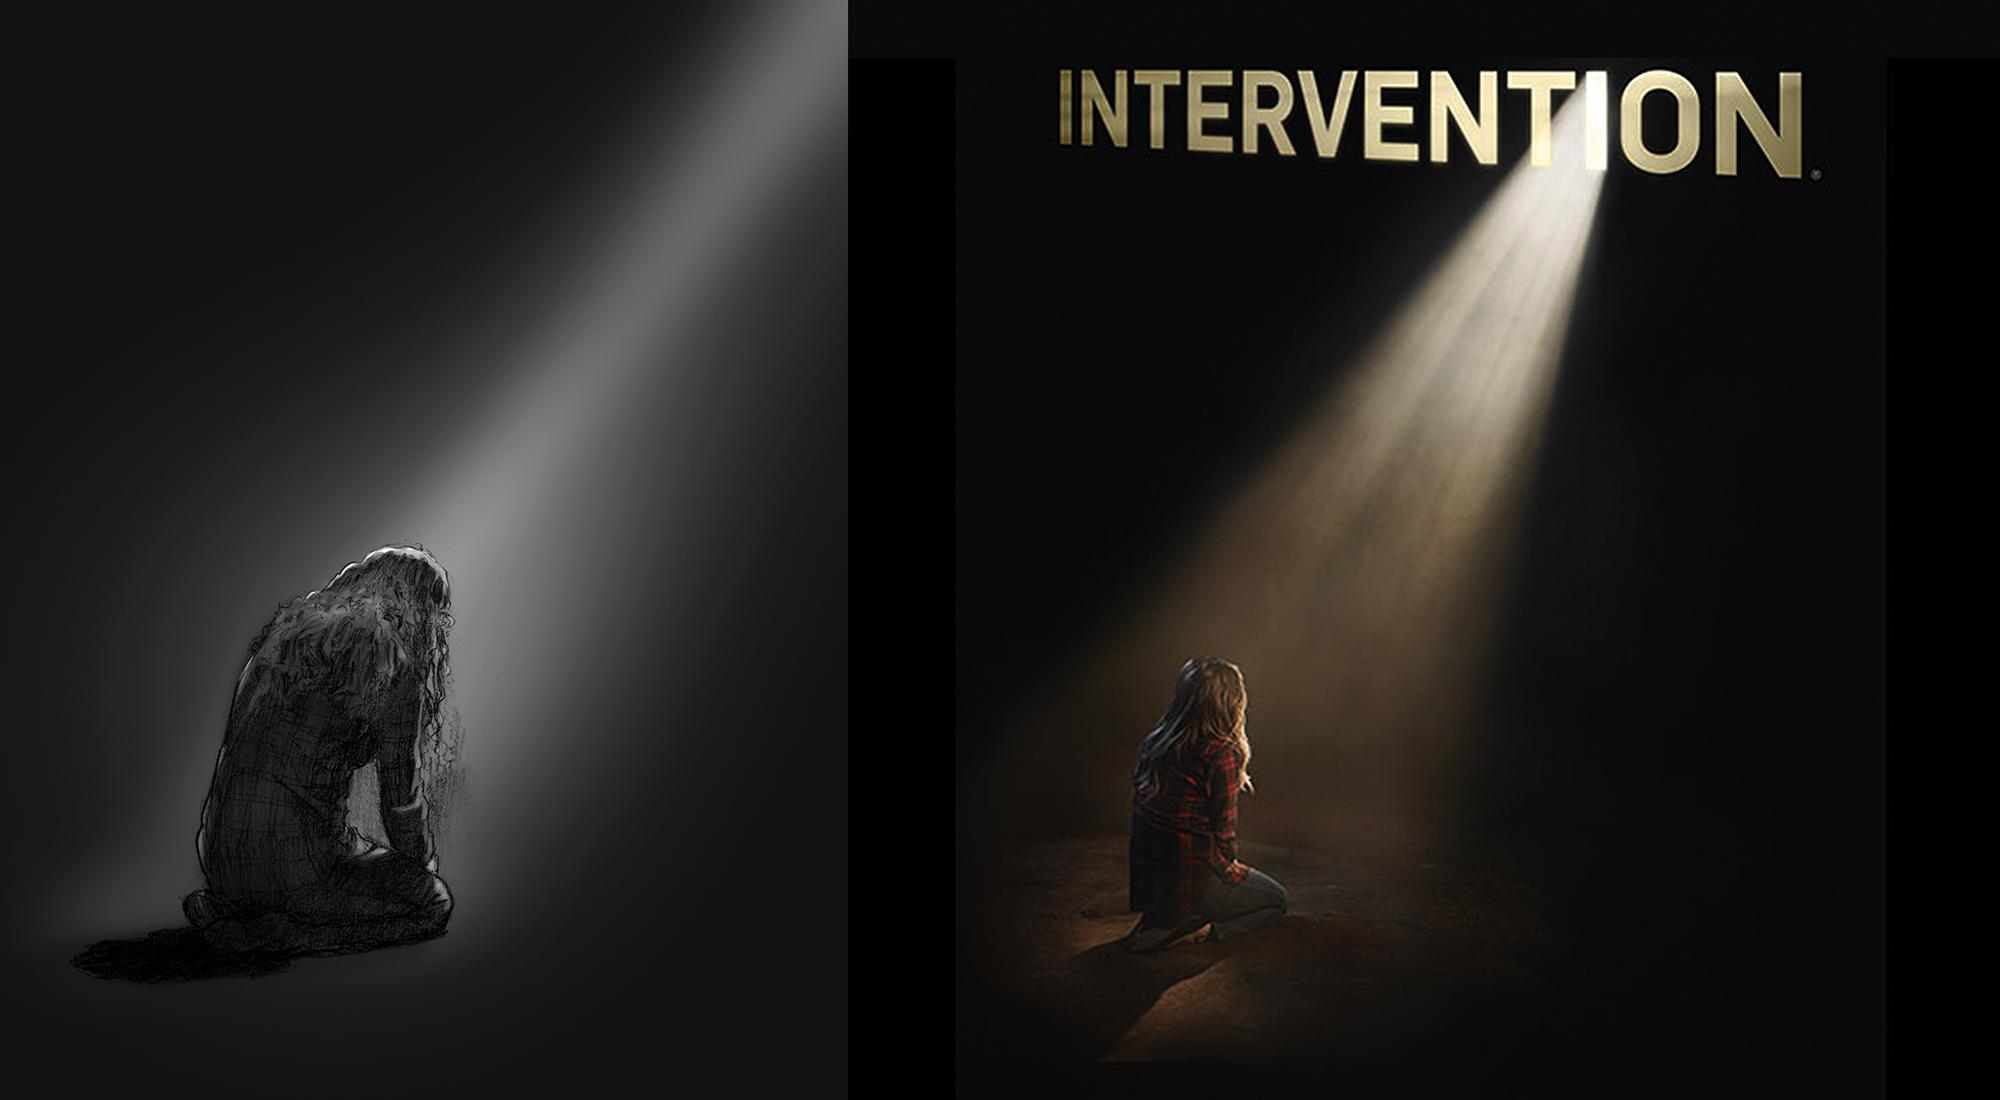 intervention_sbs.jpg